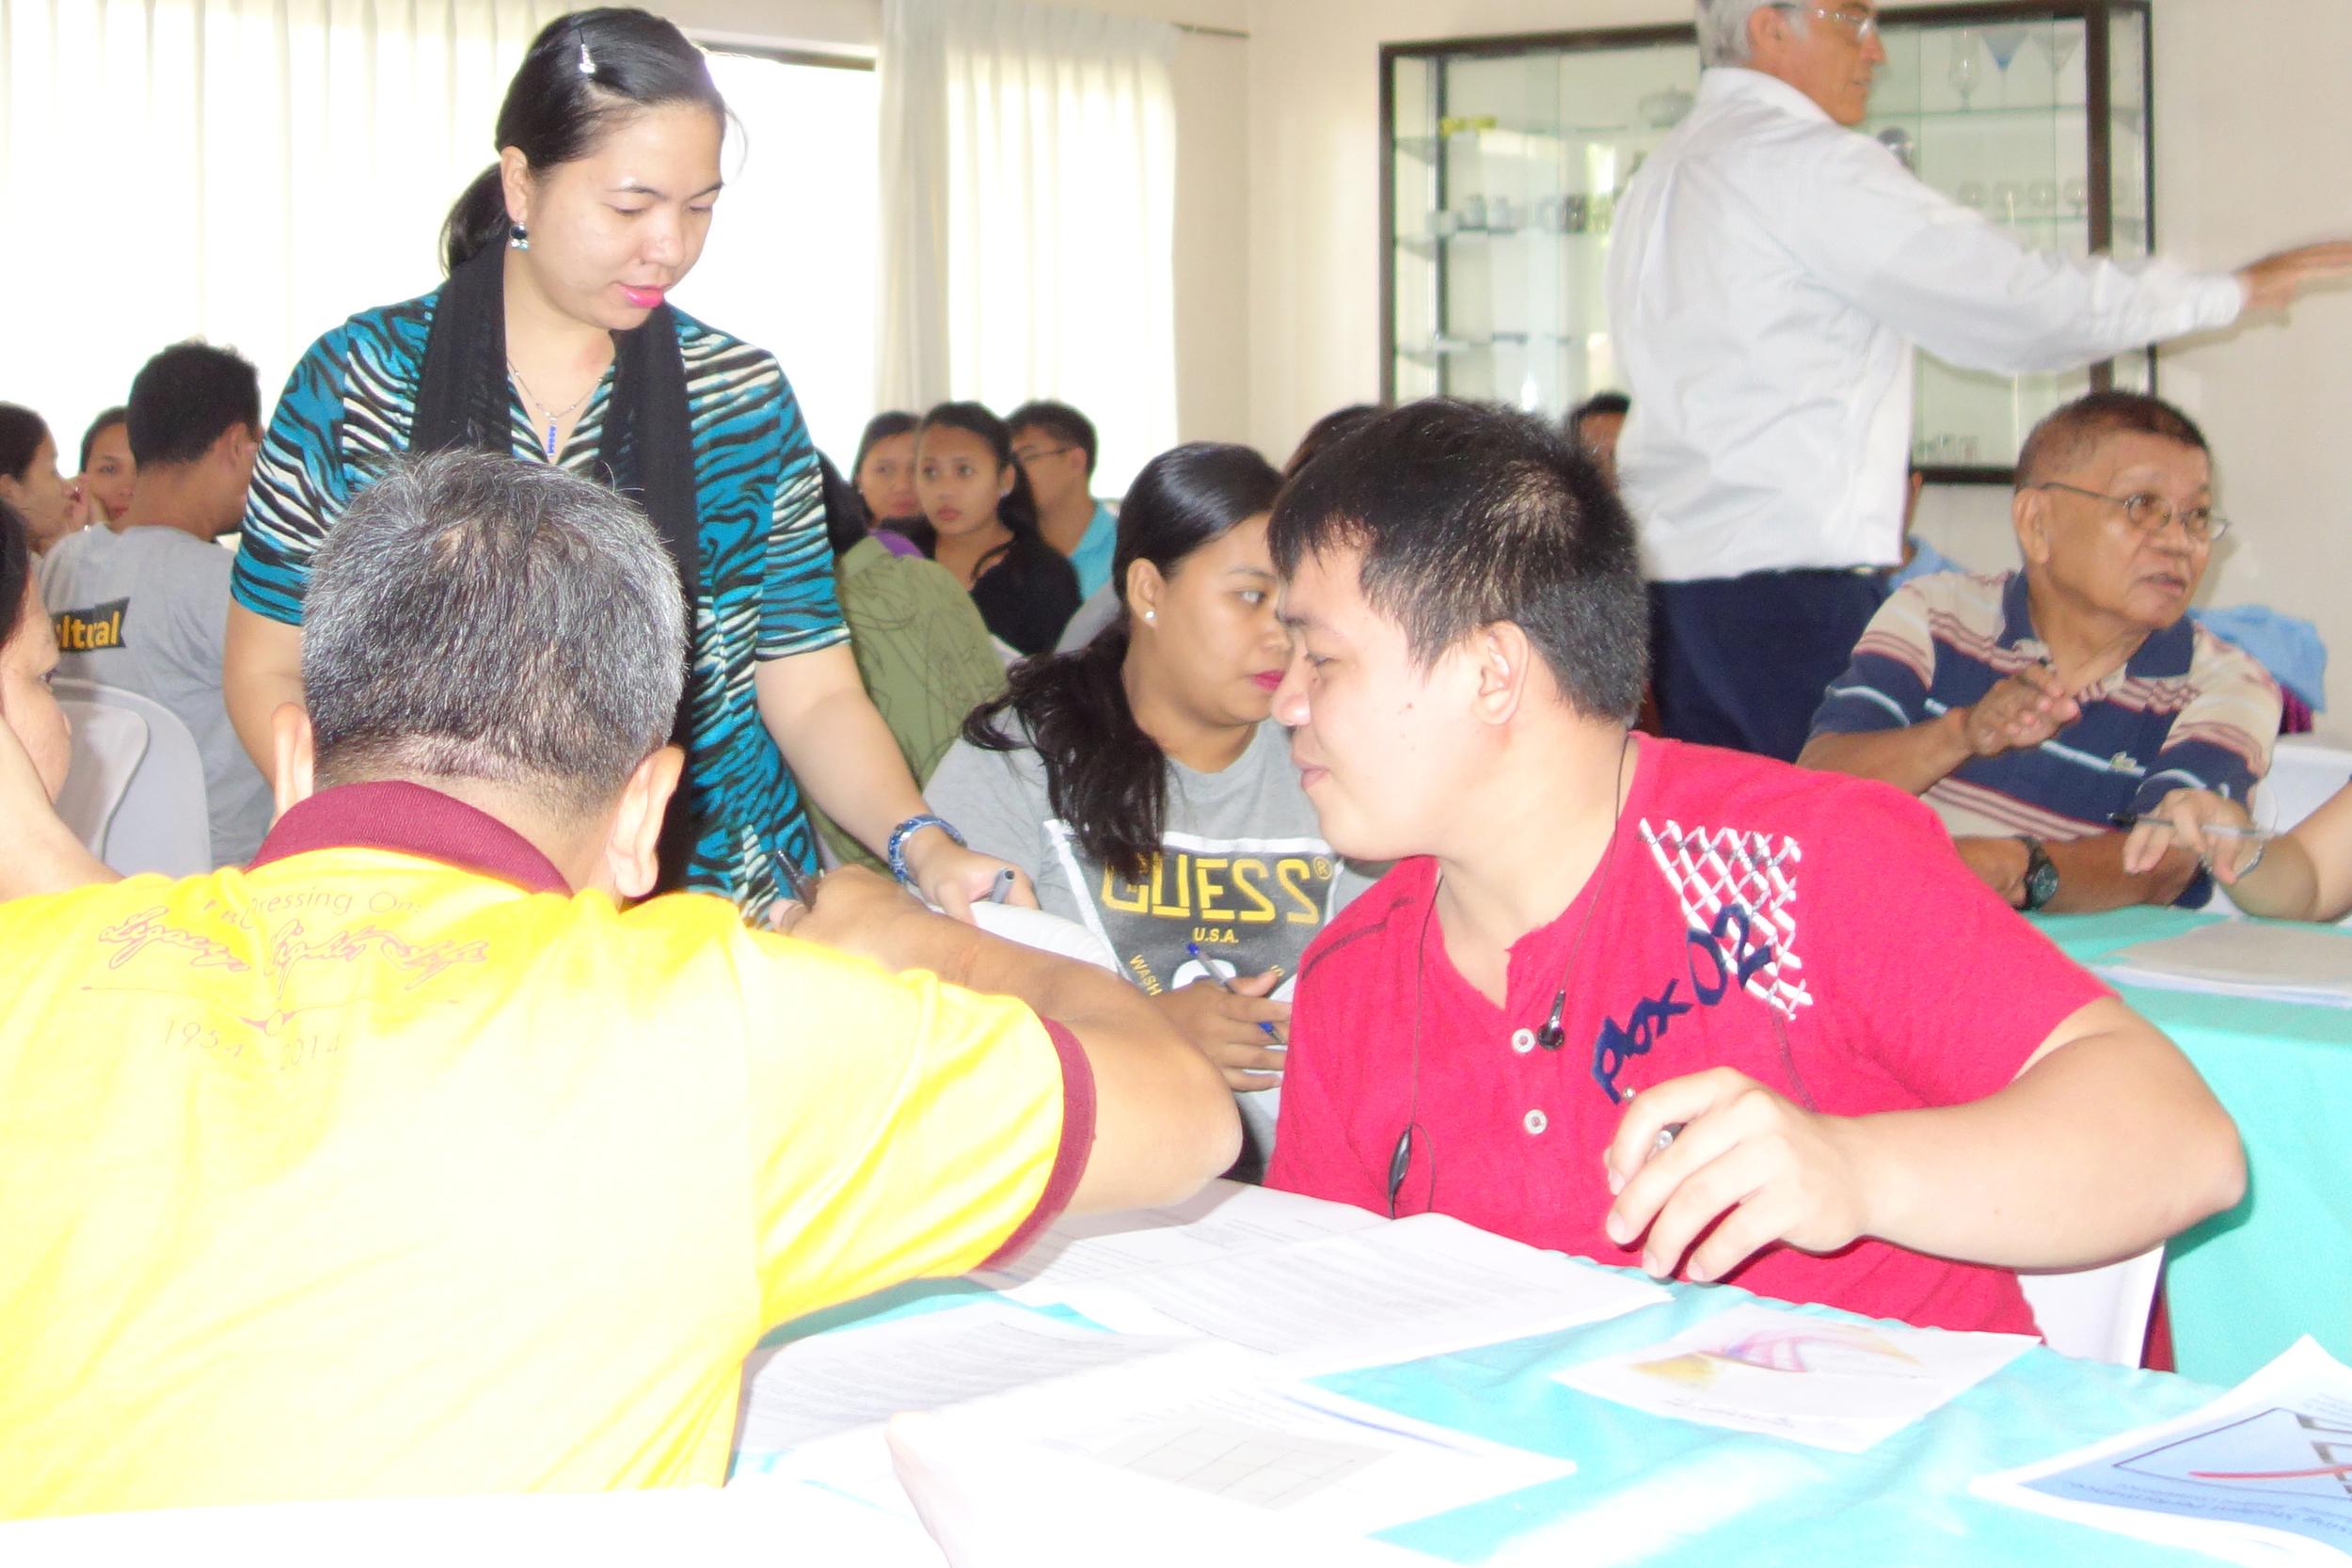 2014 Philippines kabankalan group.jpg